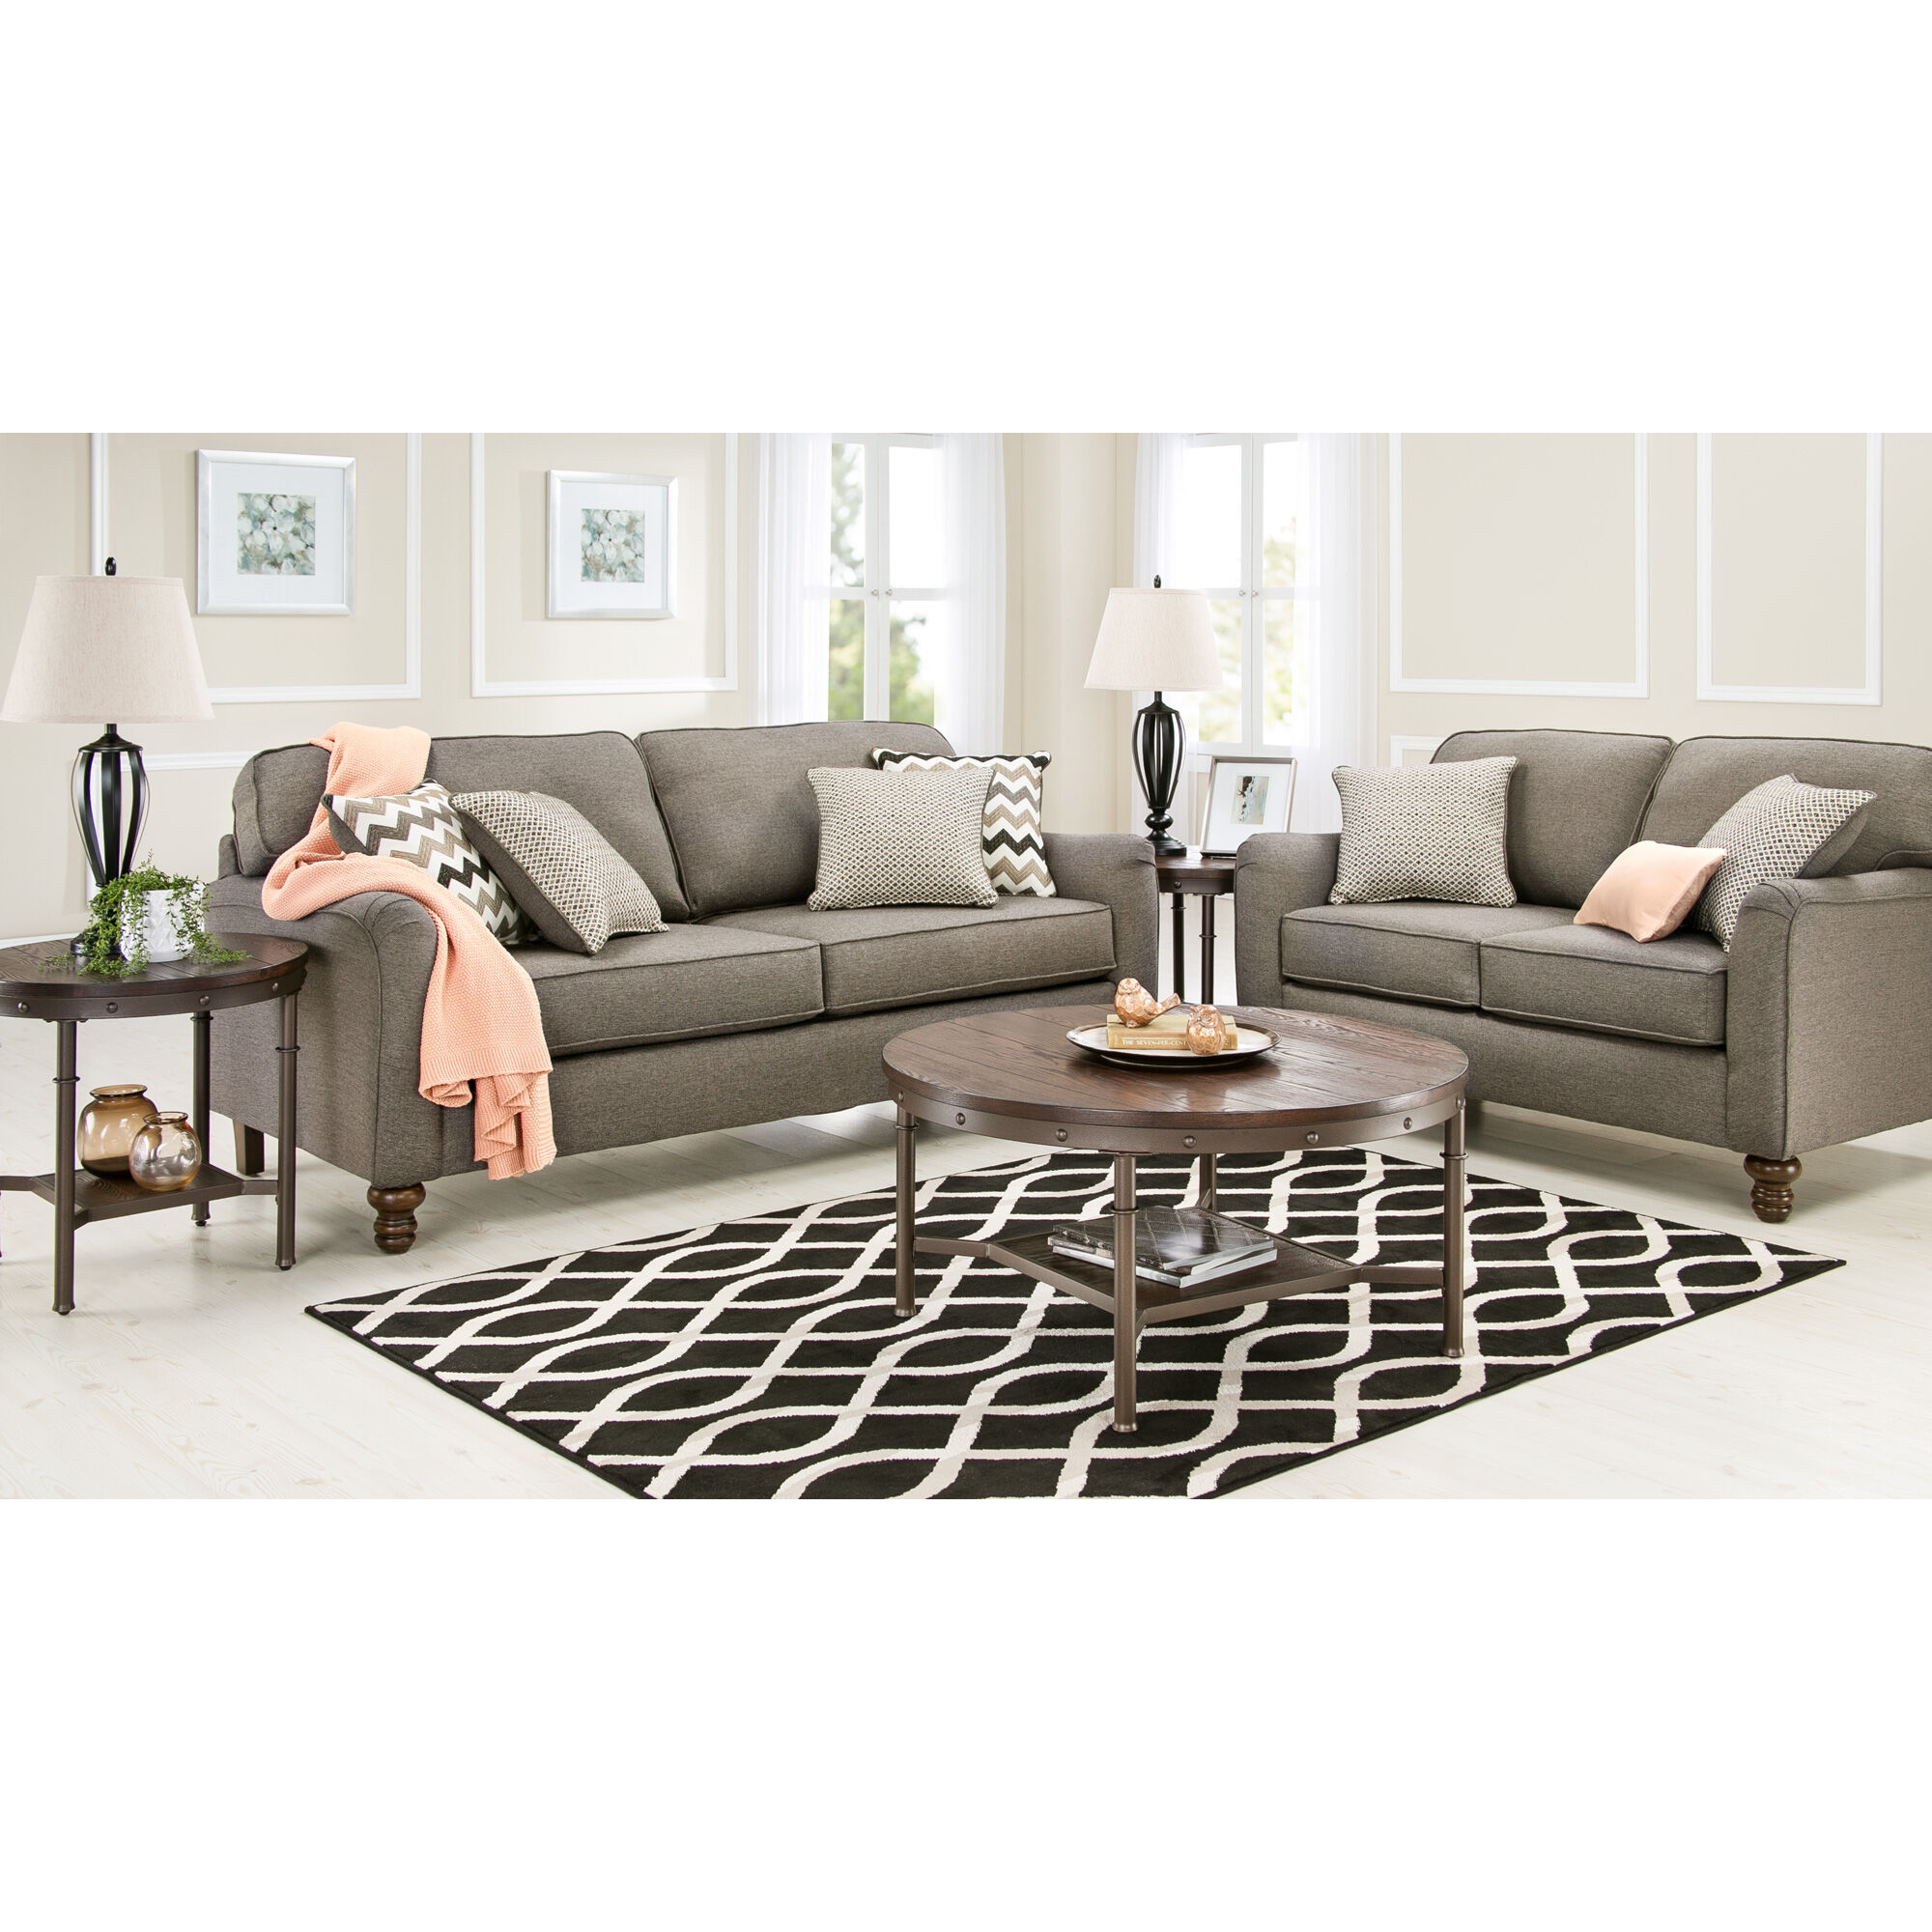 slumberland sofa recliners karlstad legs furniture | coleton ash